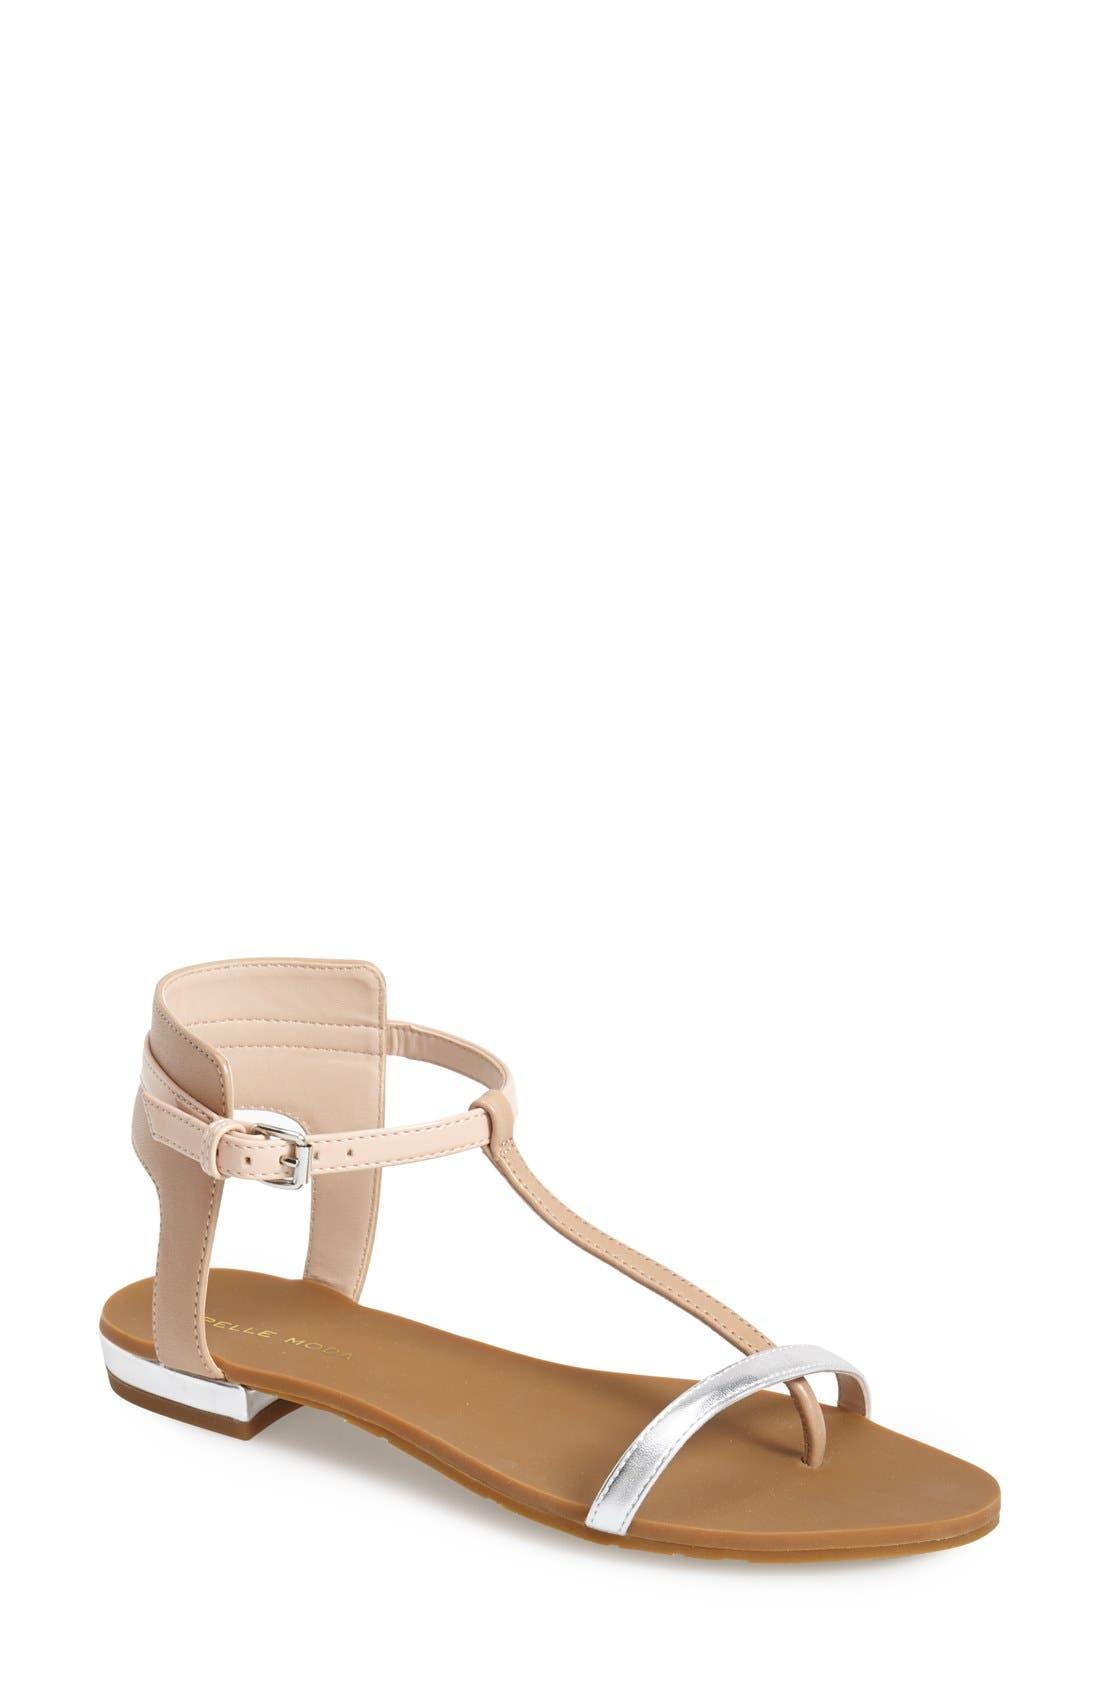 Main Image - Pelle Moda 'Bedi' Ankle Strap Thong Sandal (Women)